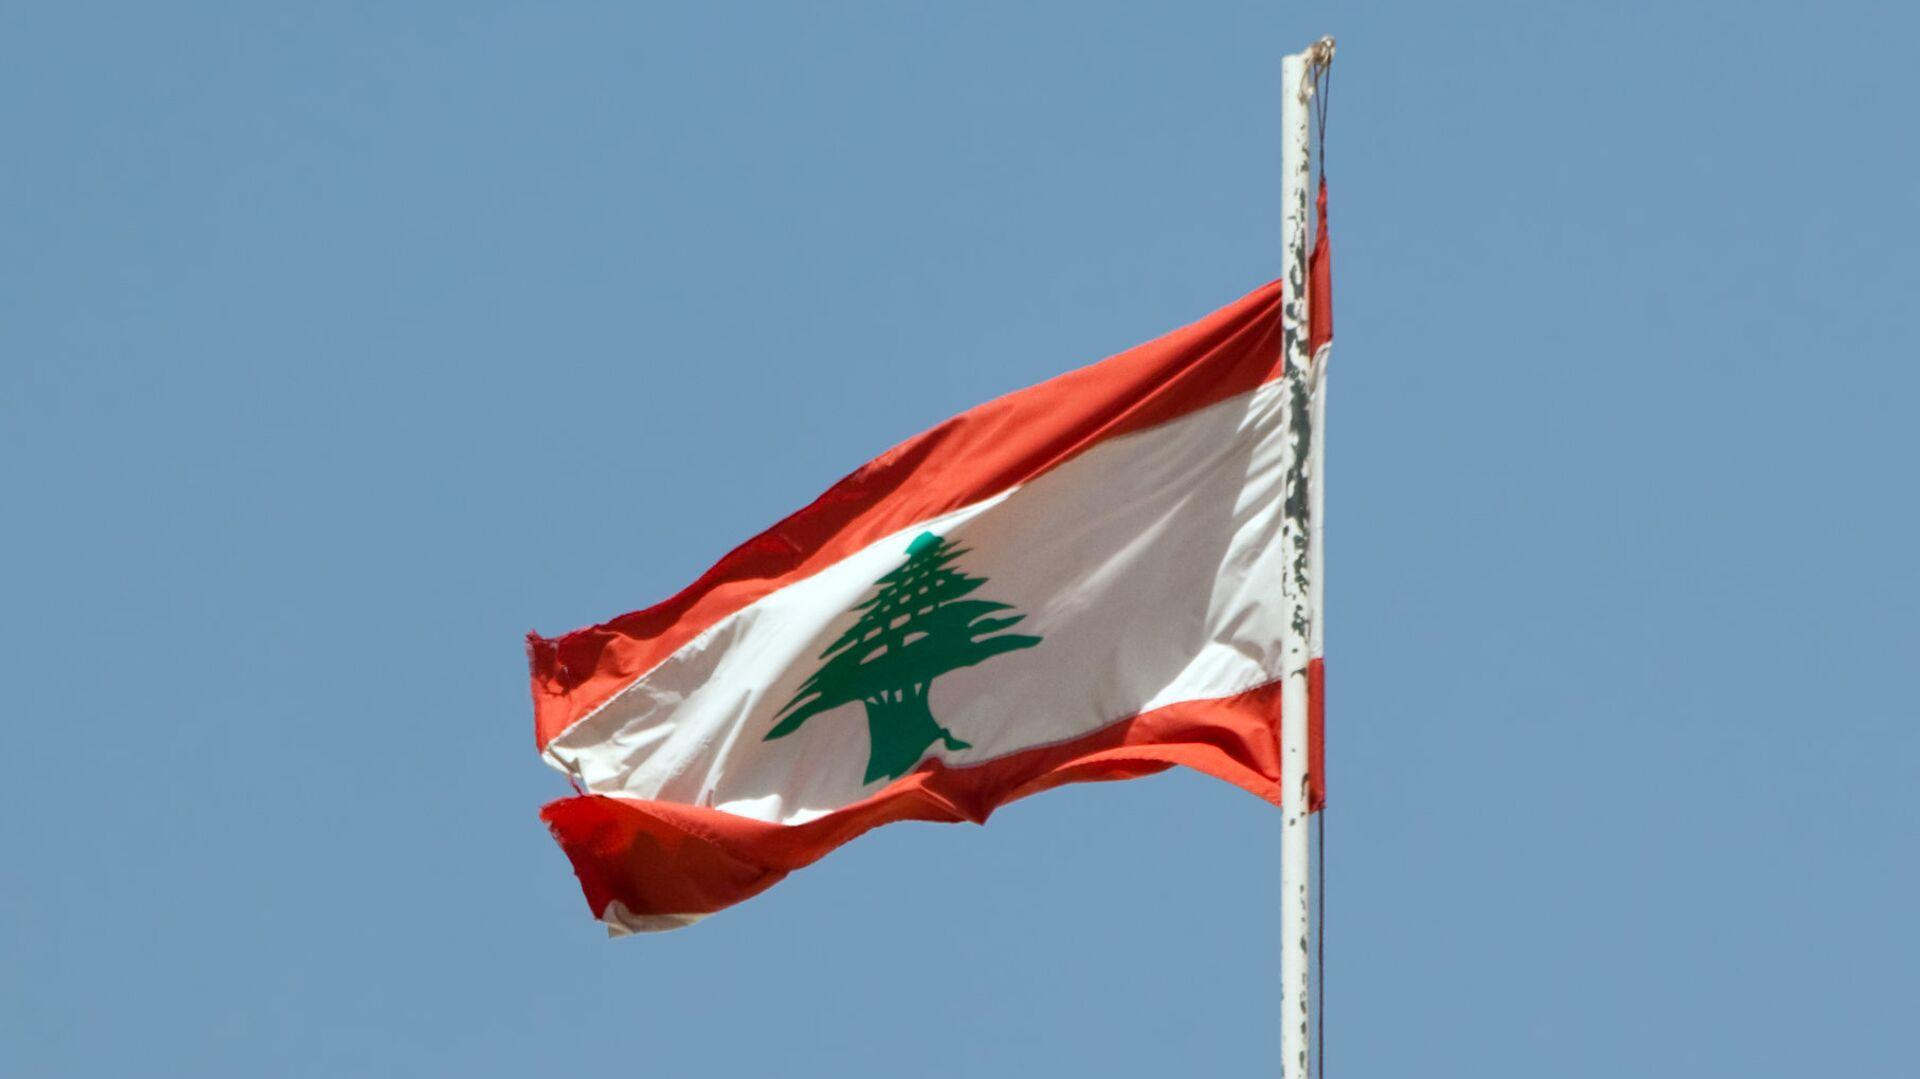 Bandera del Líbano - Sputnik Mundo, 1920, 21.09.2021